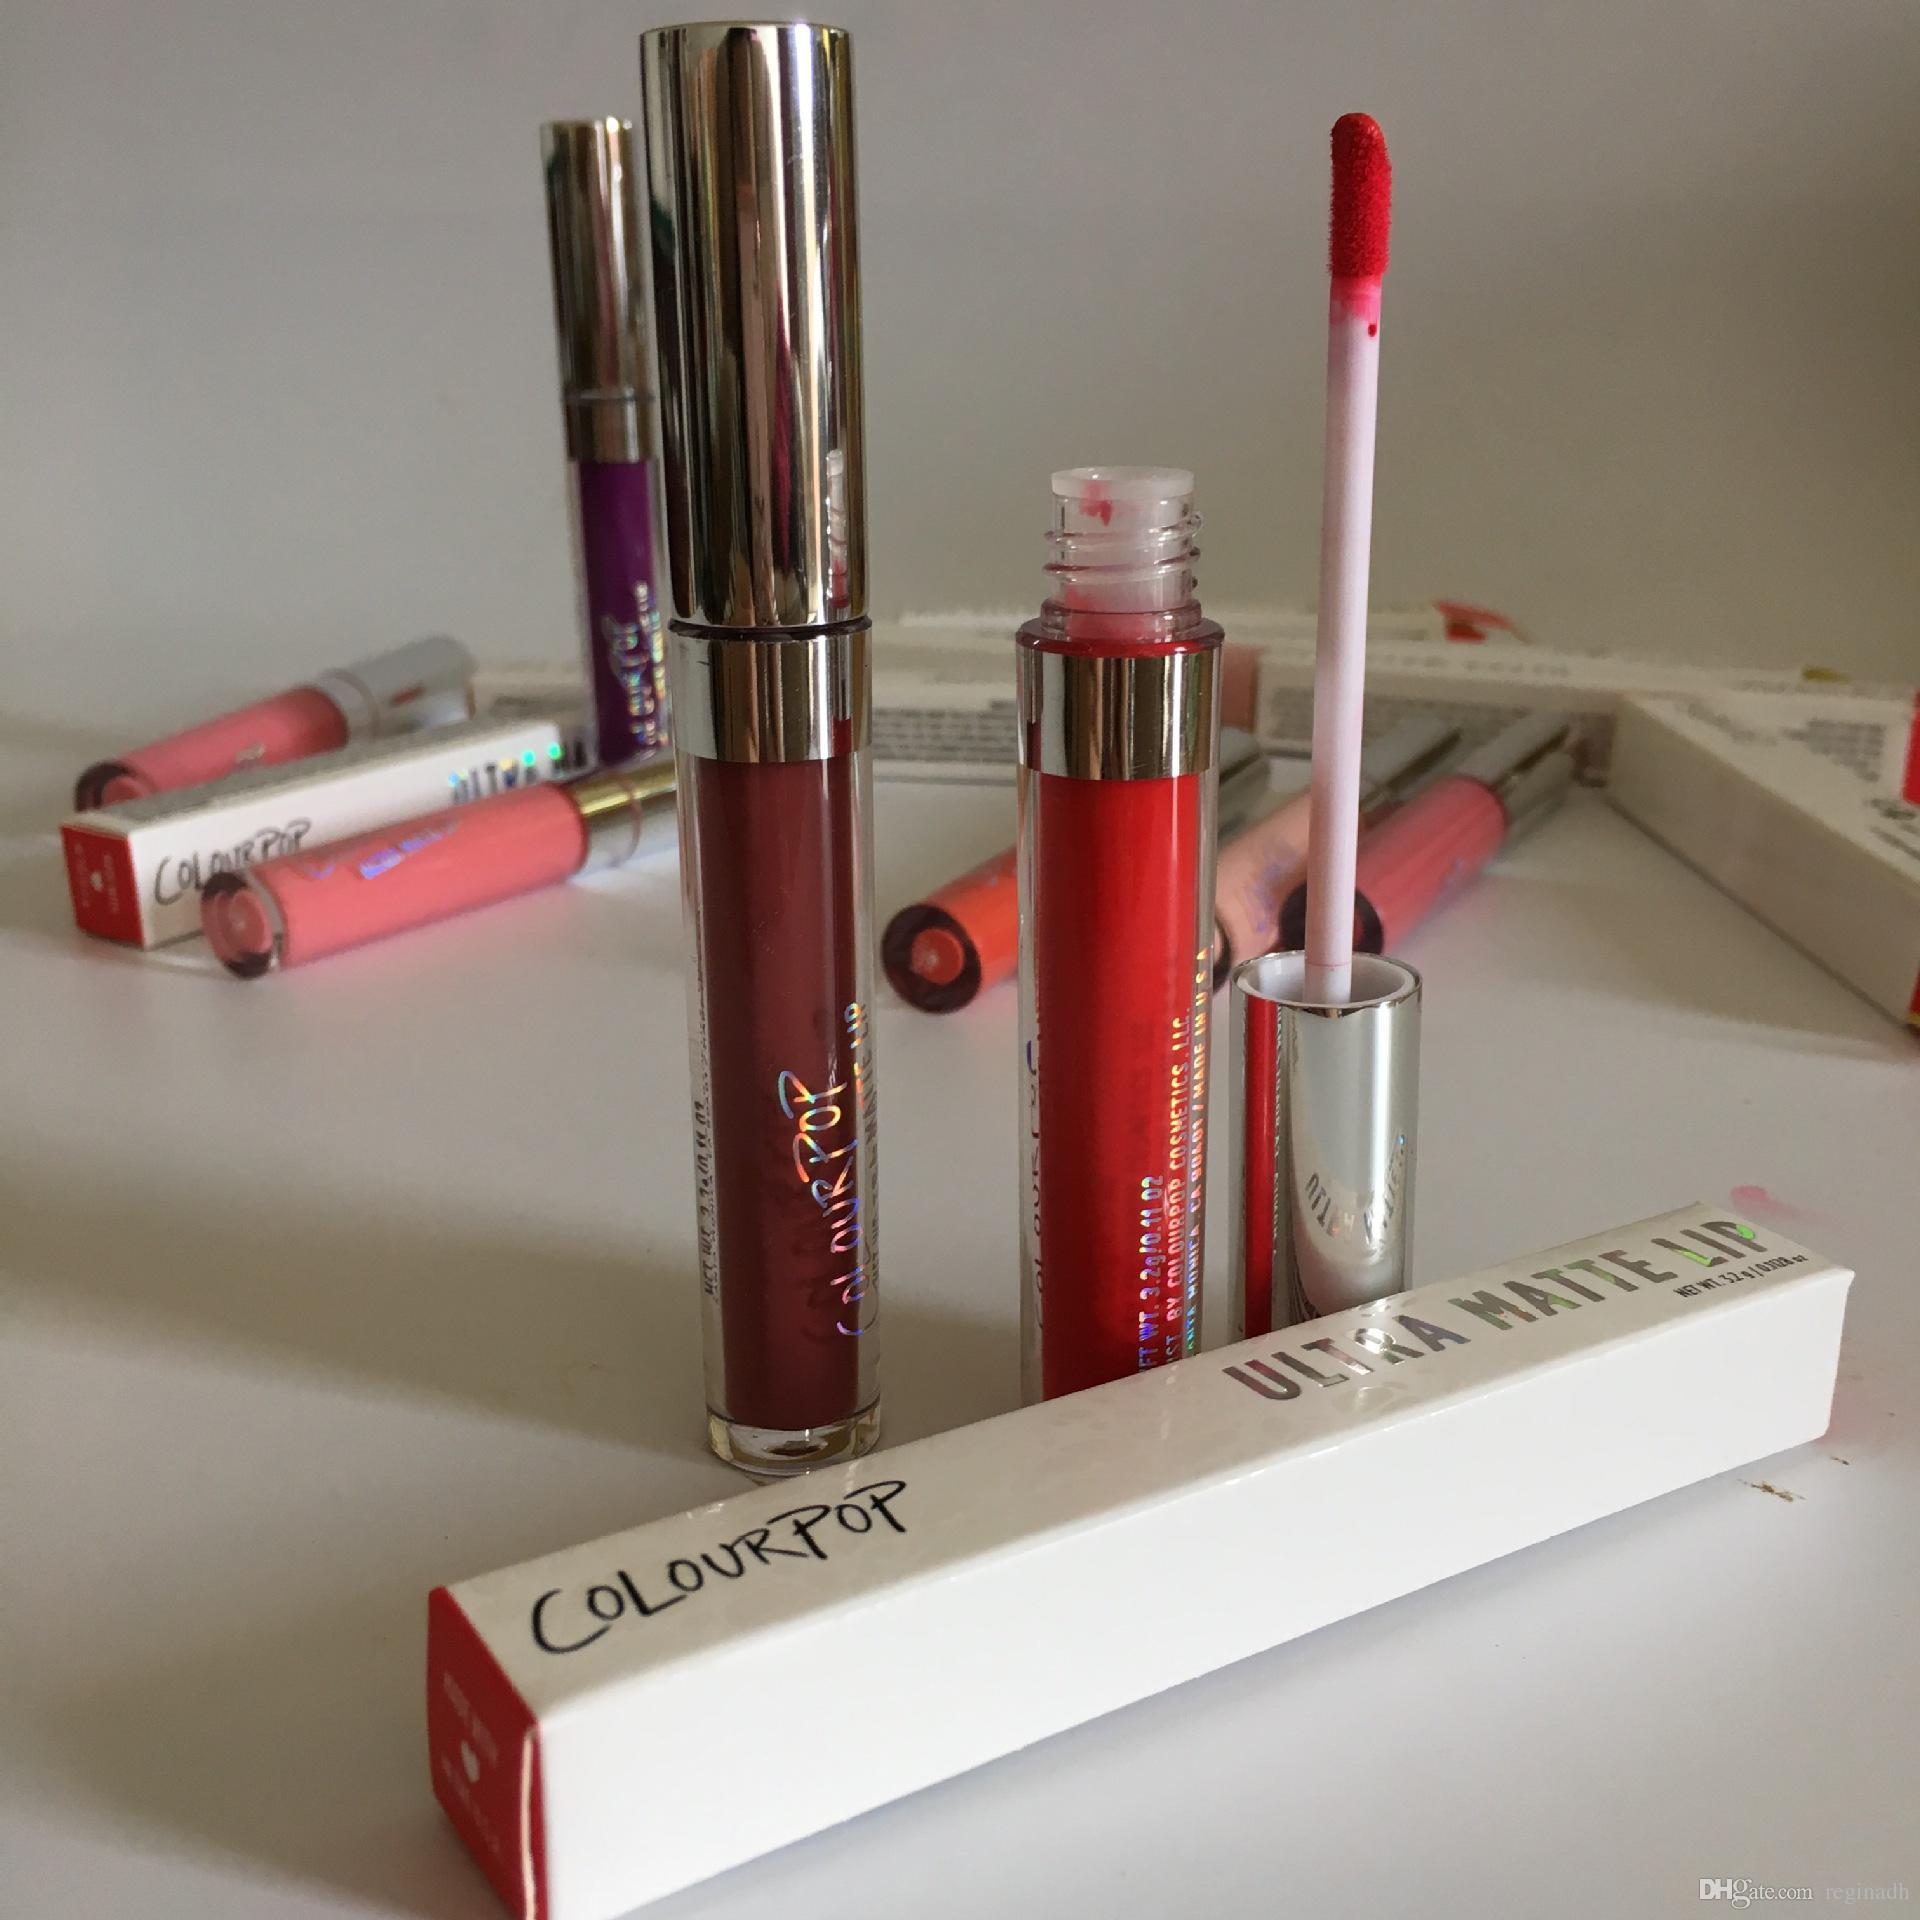 24 Colors Colourpop Lip Gloss ULTRA MATTE LIQUID LIPSTICKS Various colors Long Lasting lips Colour pop lipgloss